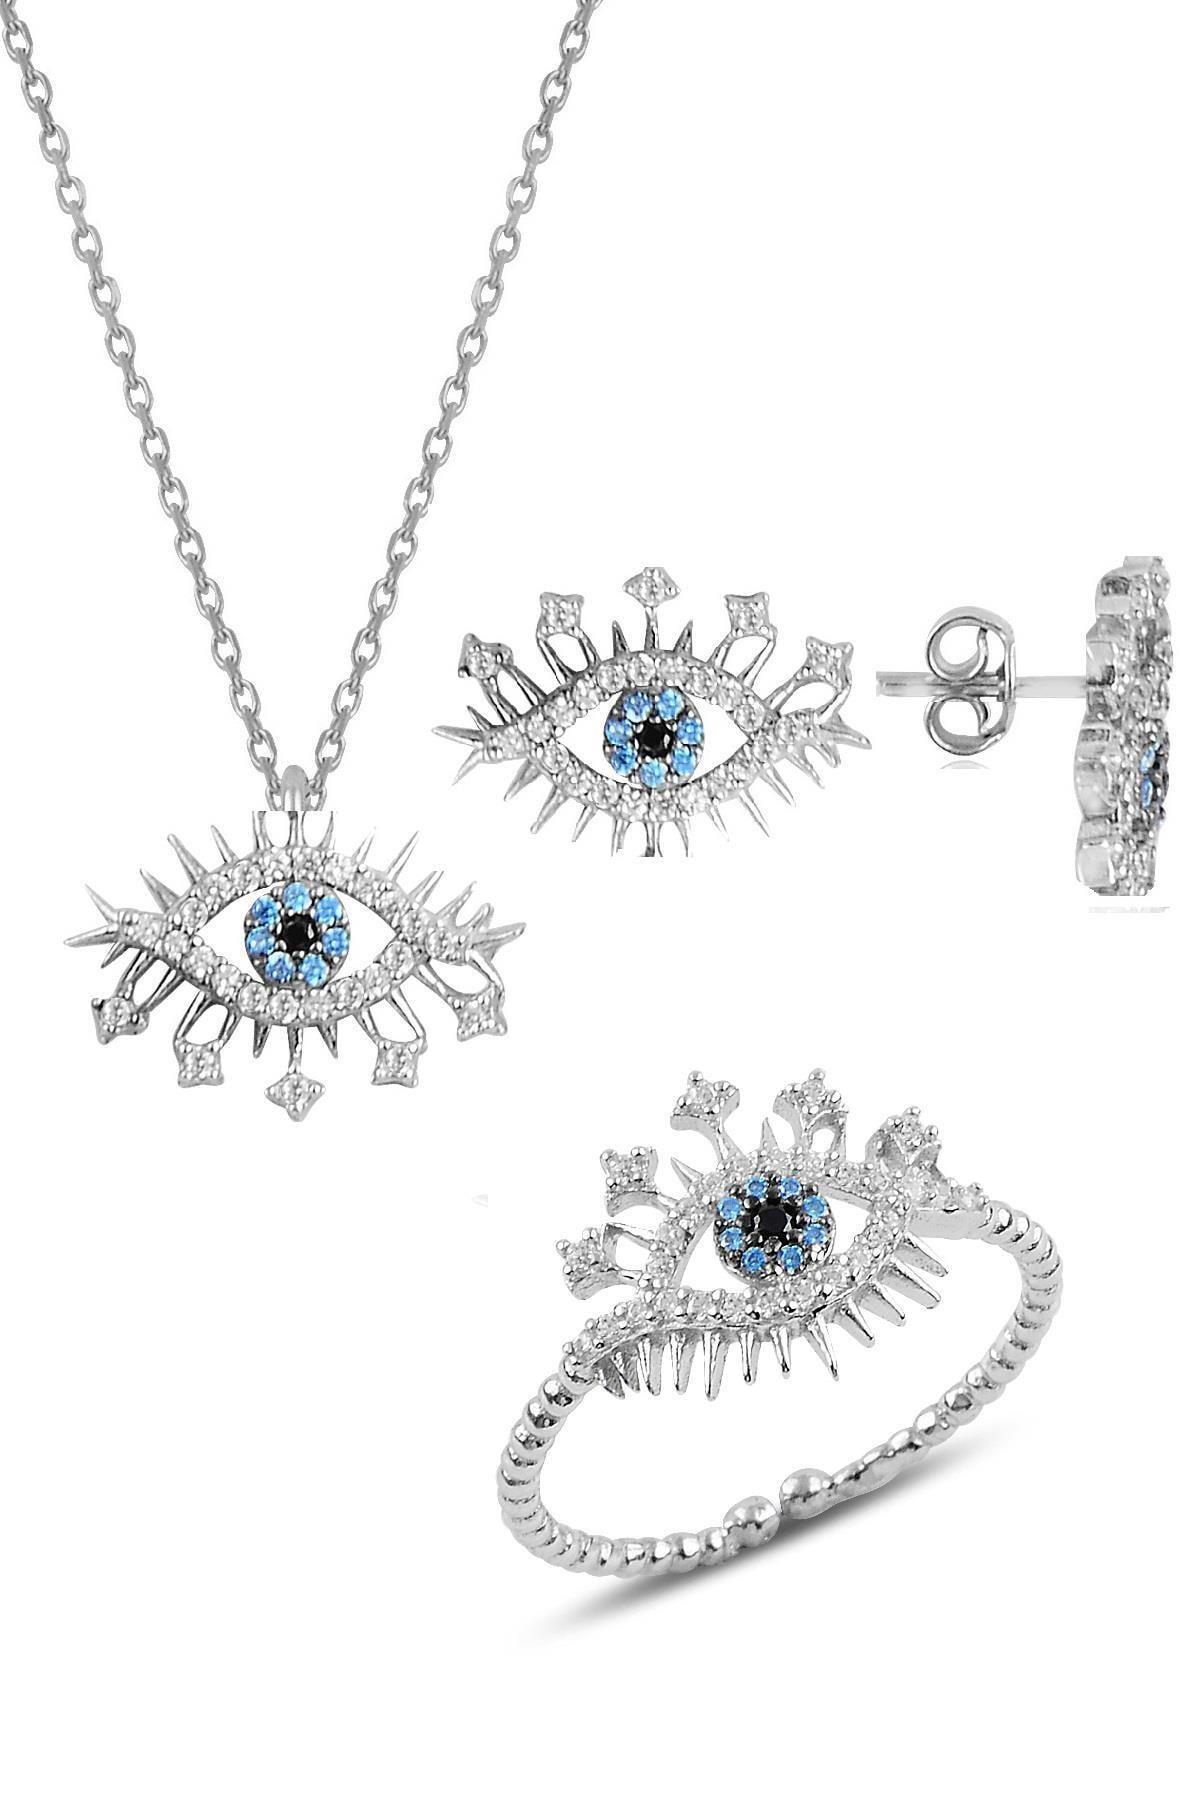 Söğütlü Silver Gümüş rodyumlu zirkon taşlı lareyn kolye küpe ve yüzük gümüş set 0